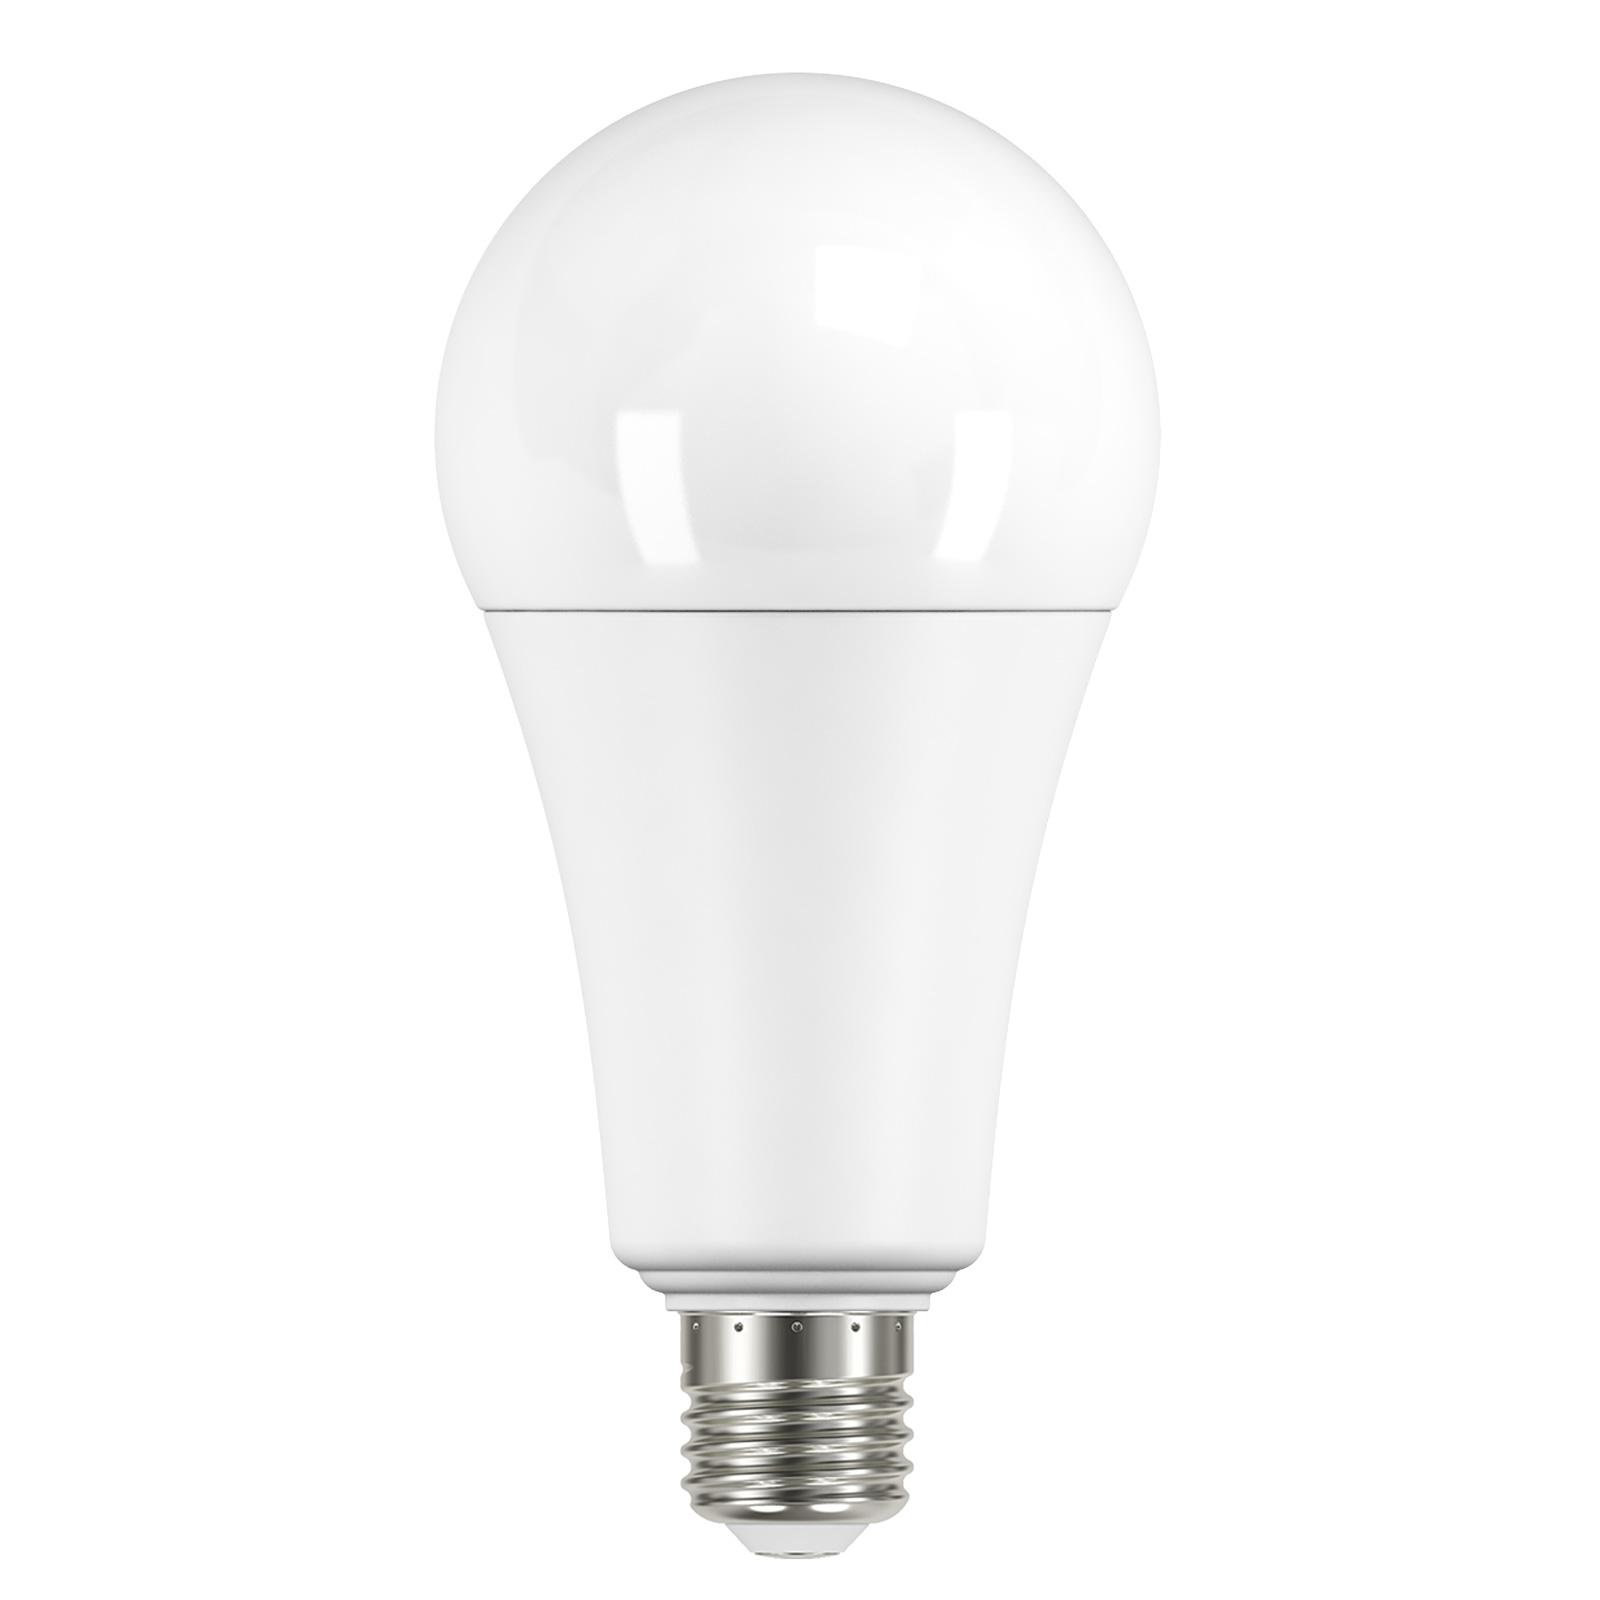 ToLEDo LED-pære E27 A60 17,5W, opal, dagslys